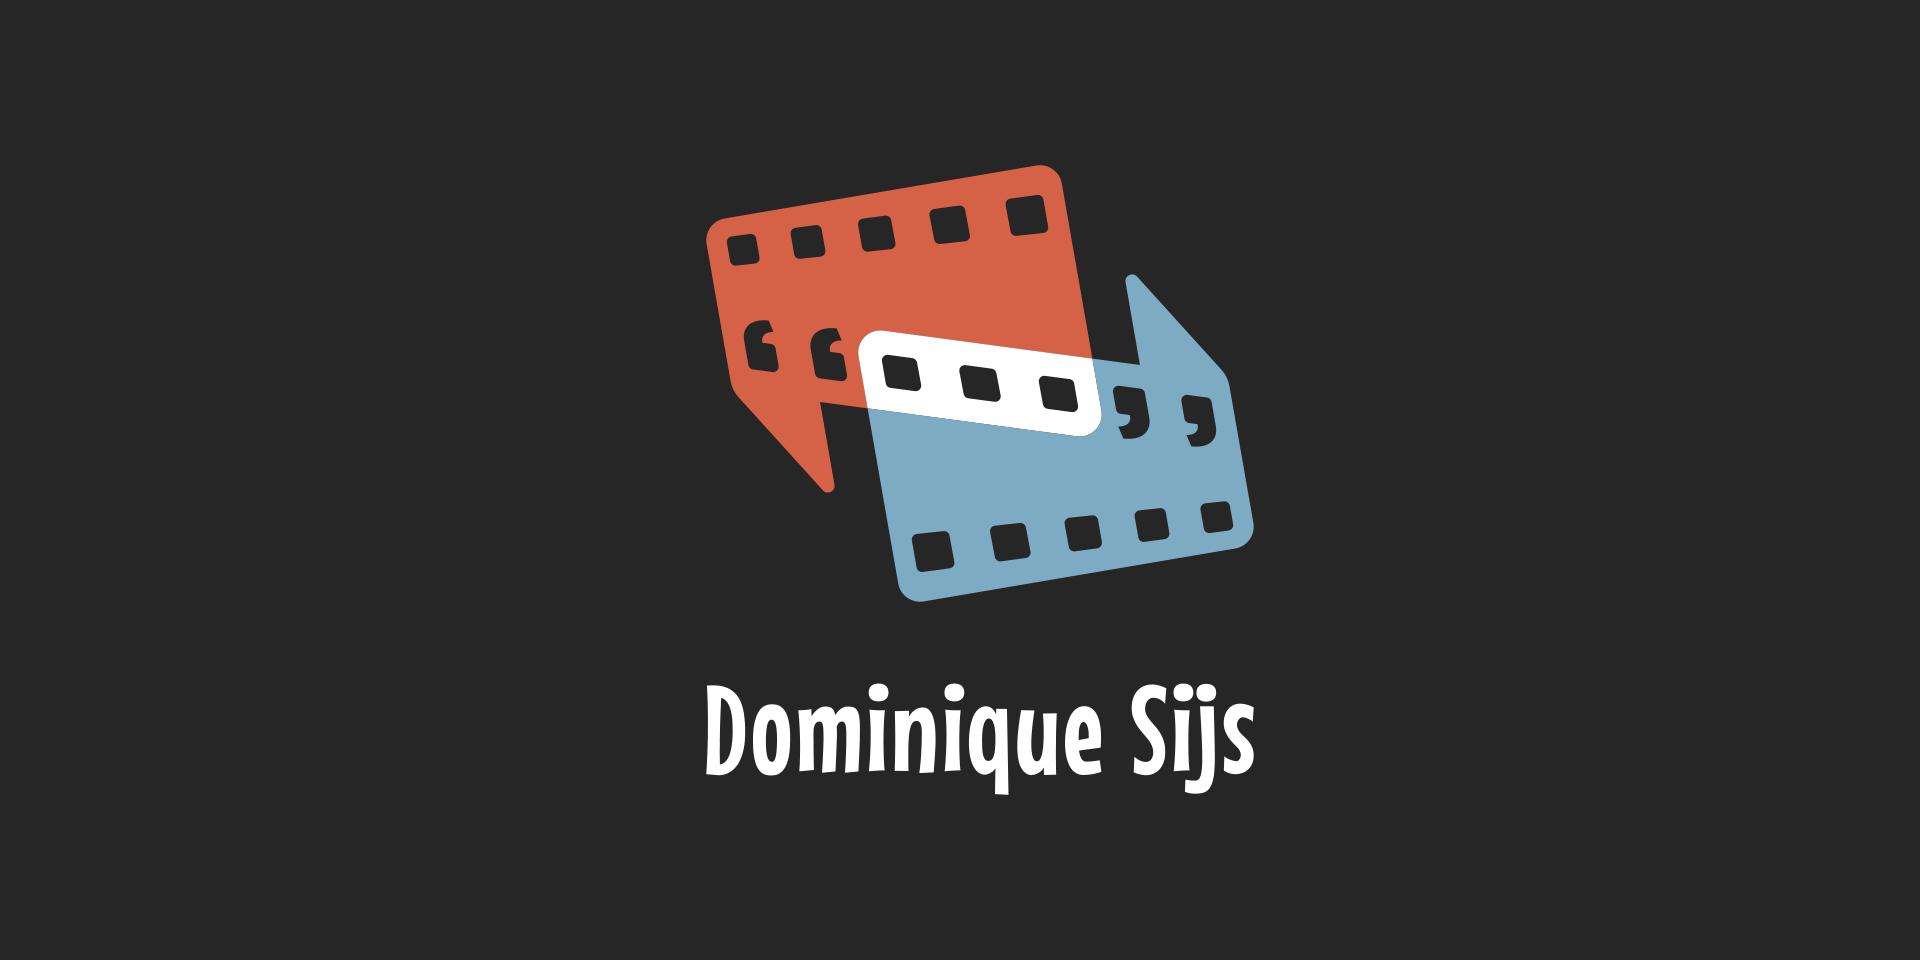 Dominique Sijs logo on black